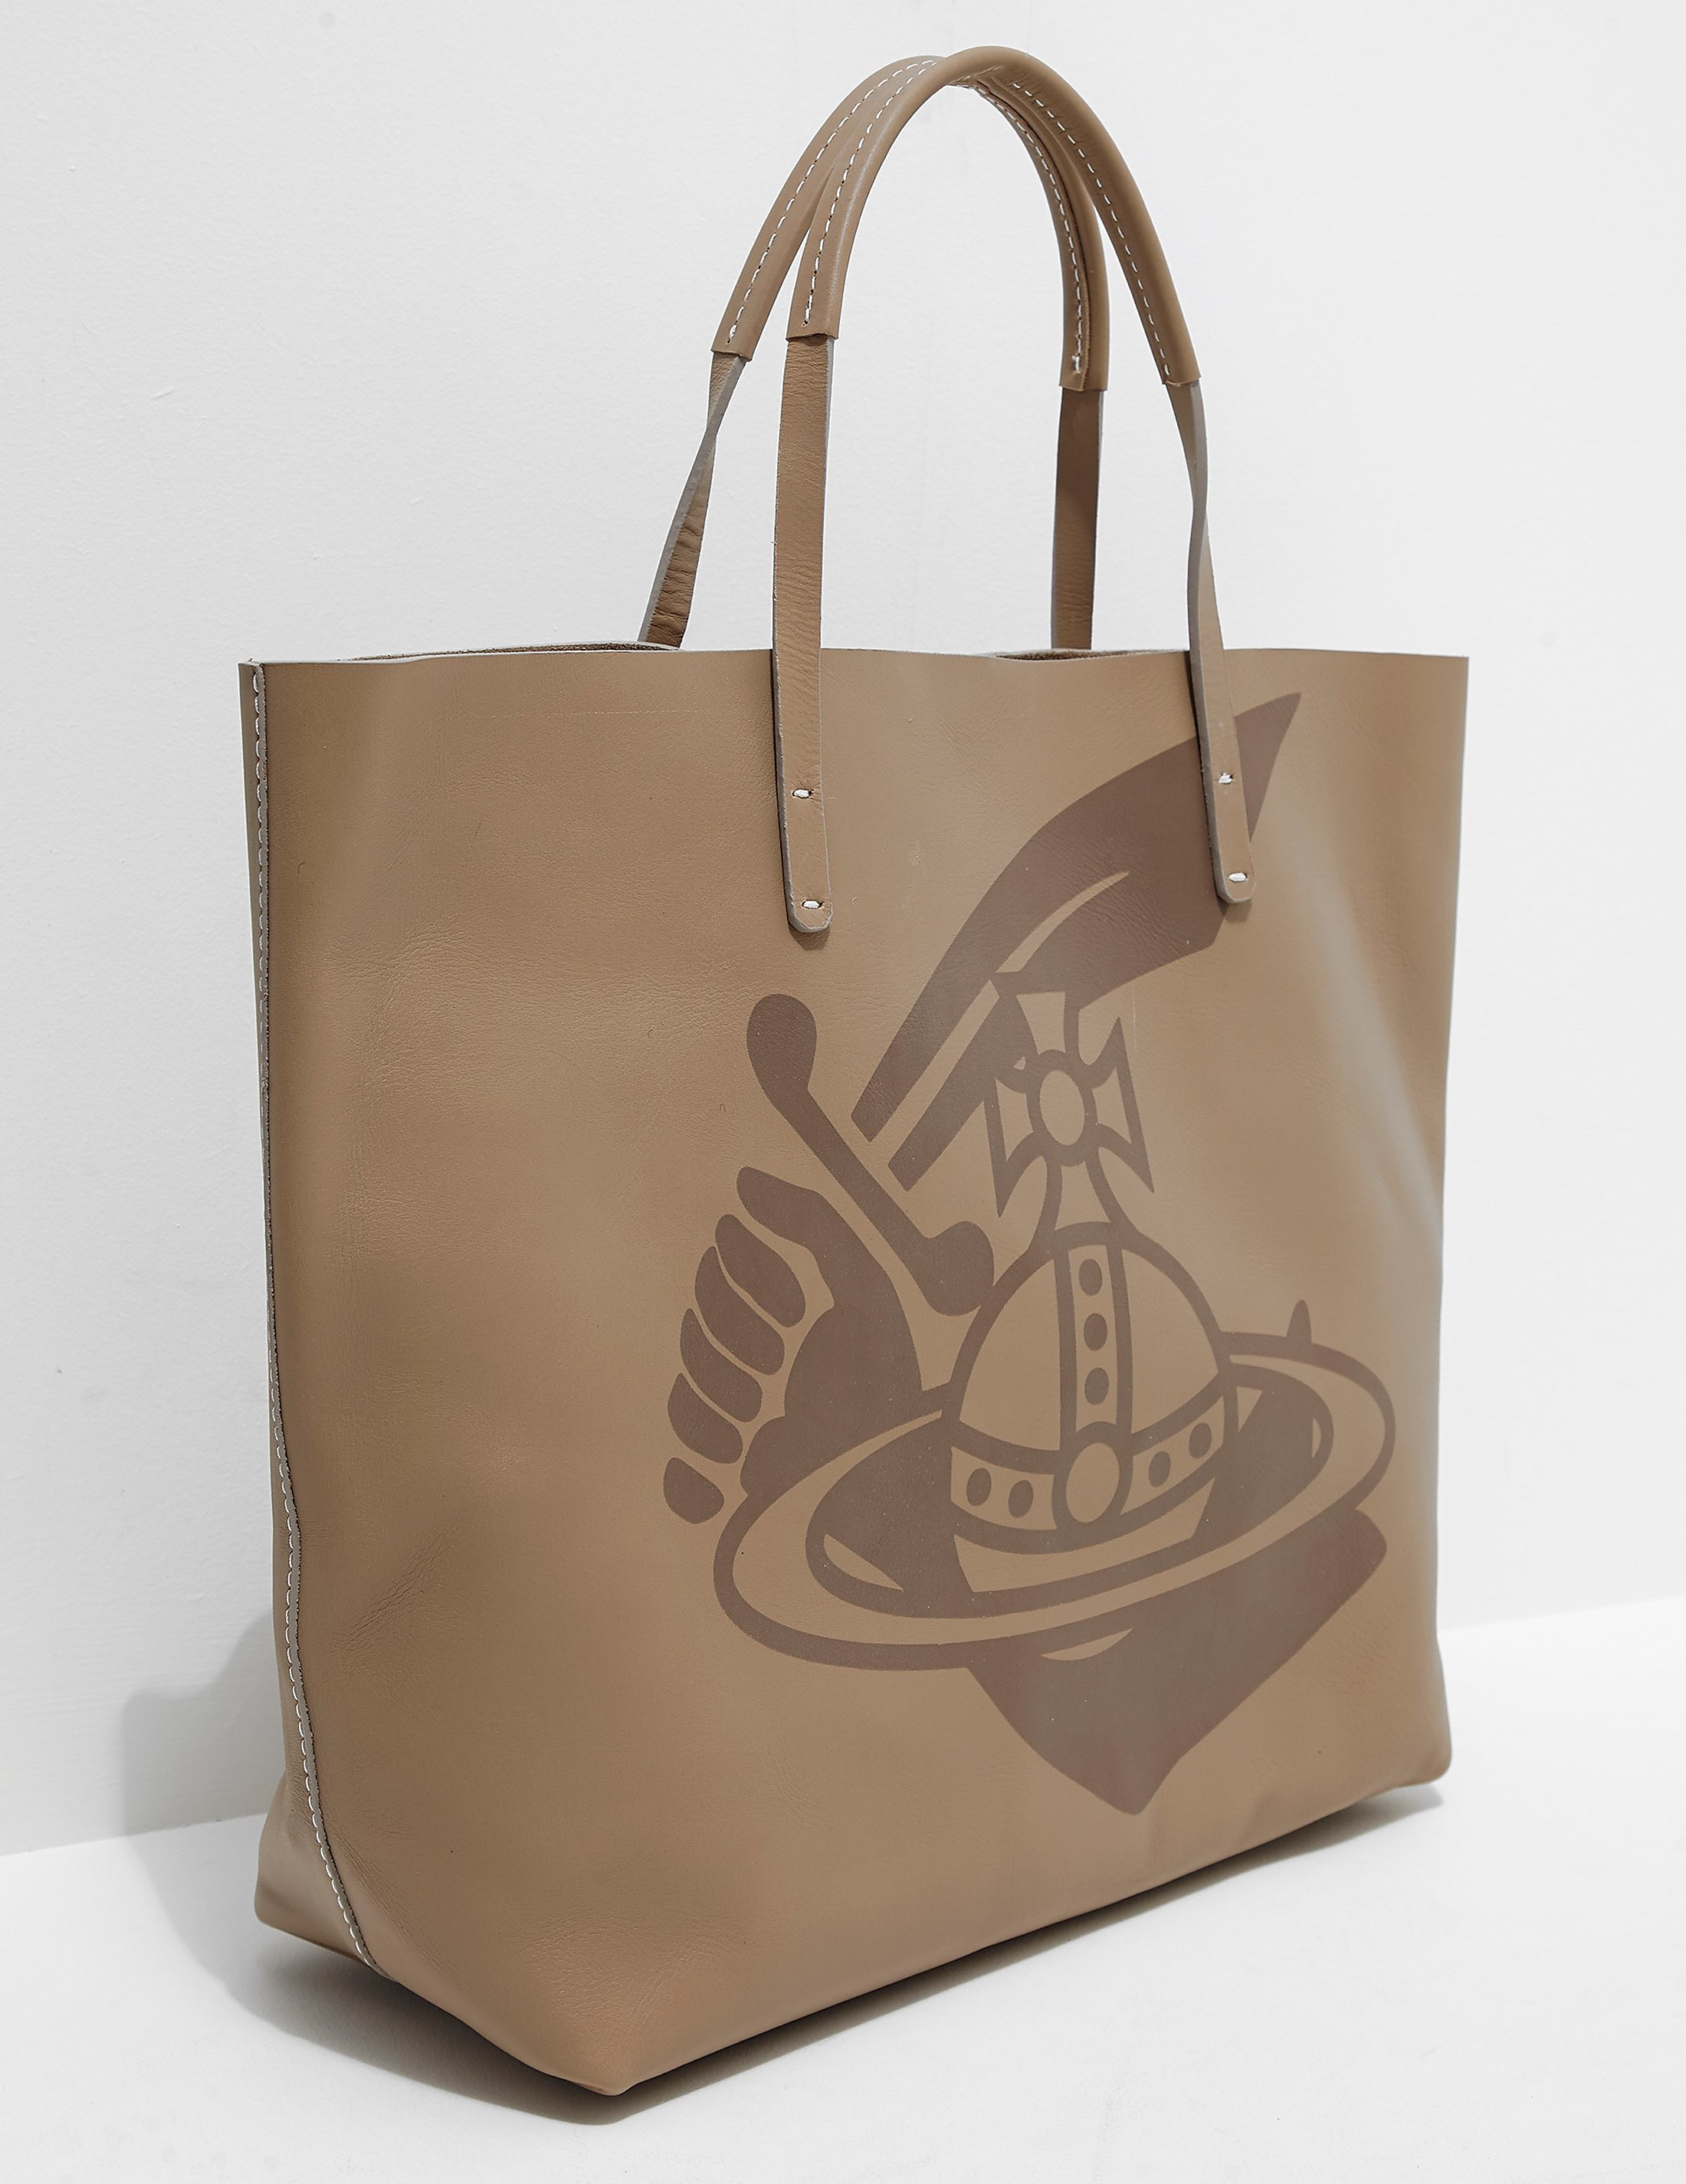 Vivienne Westwood Anglomania Africa Shopper Bag